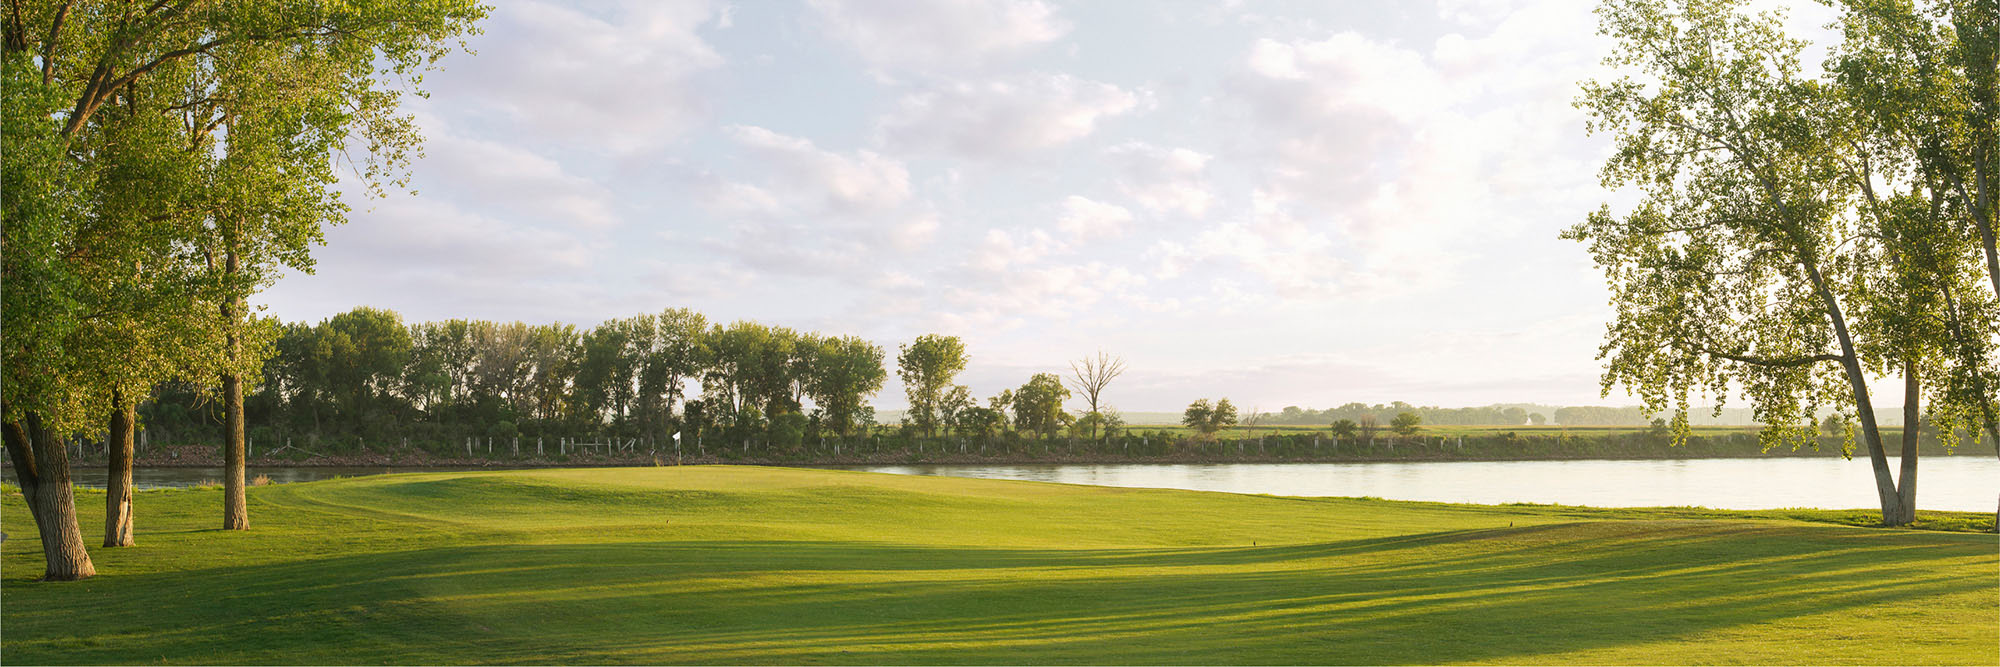 Golf Course Image - Dakota Dunes No. 17